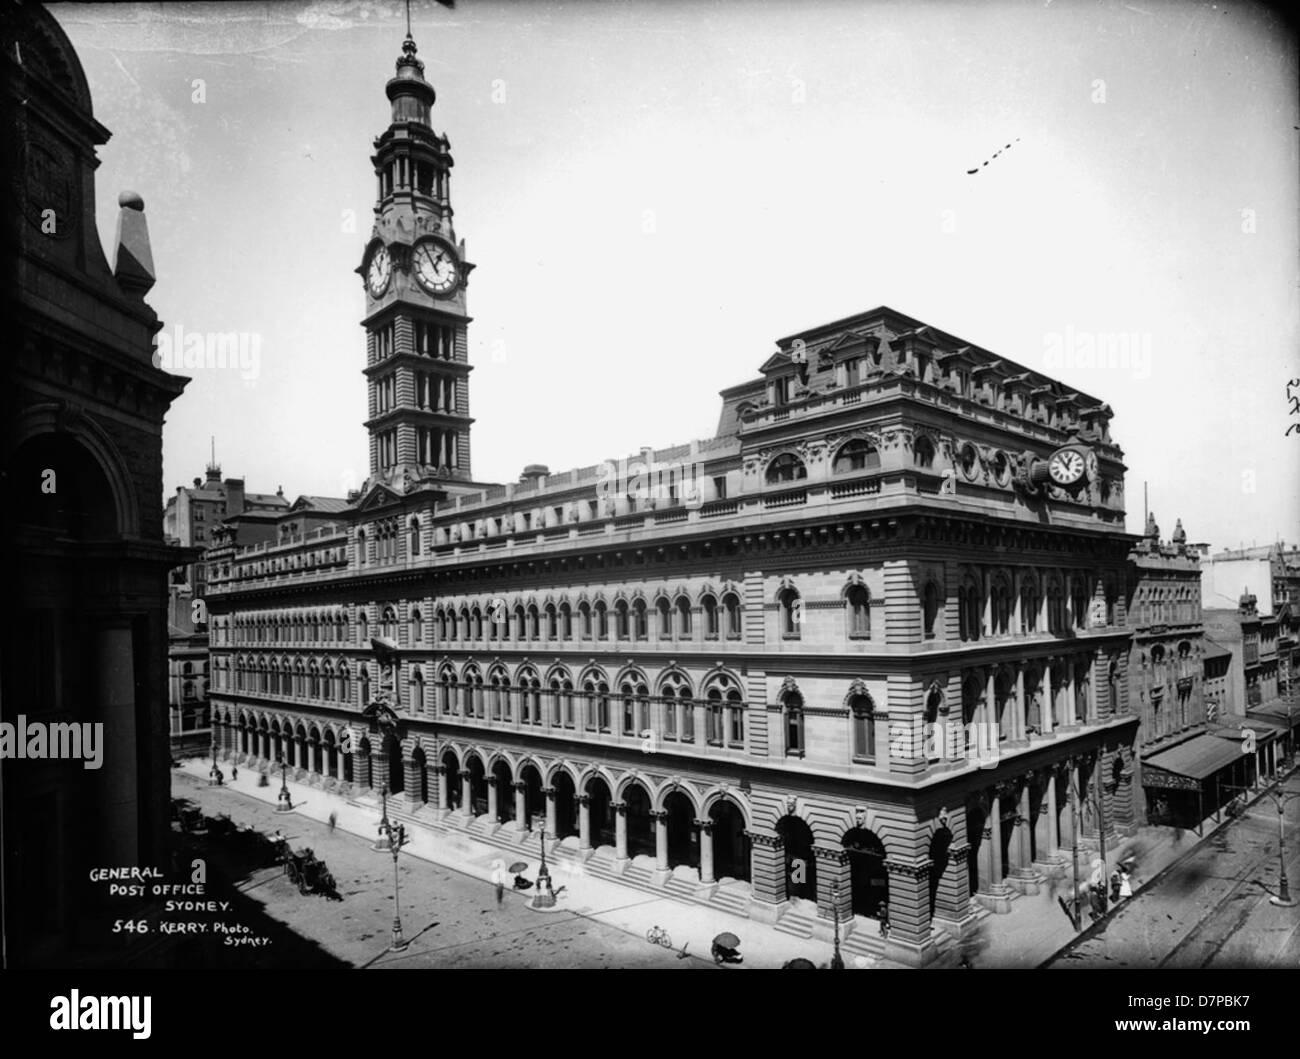 General Post Office, Sydney - Stock Image